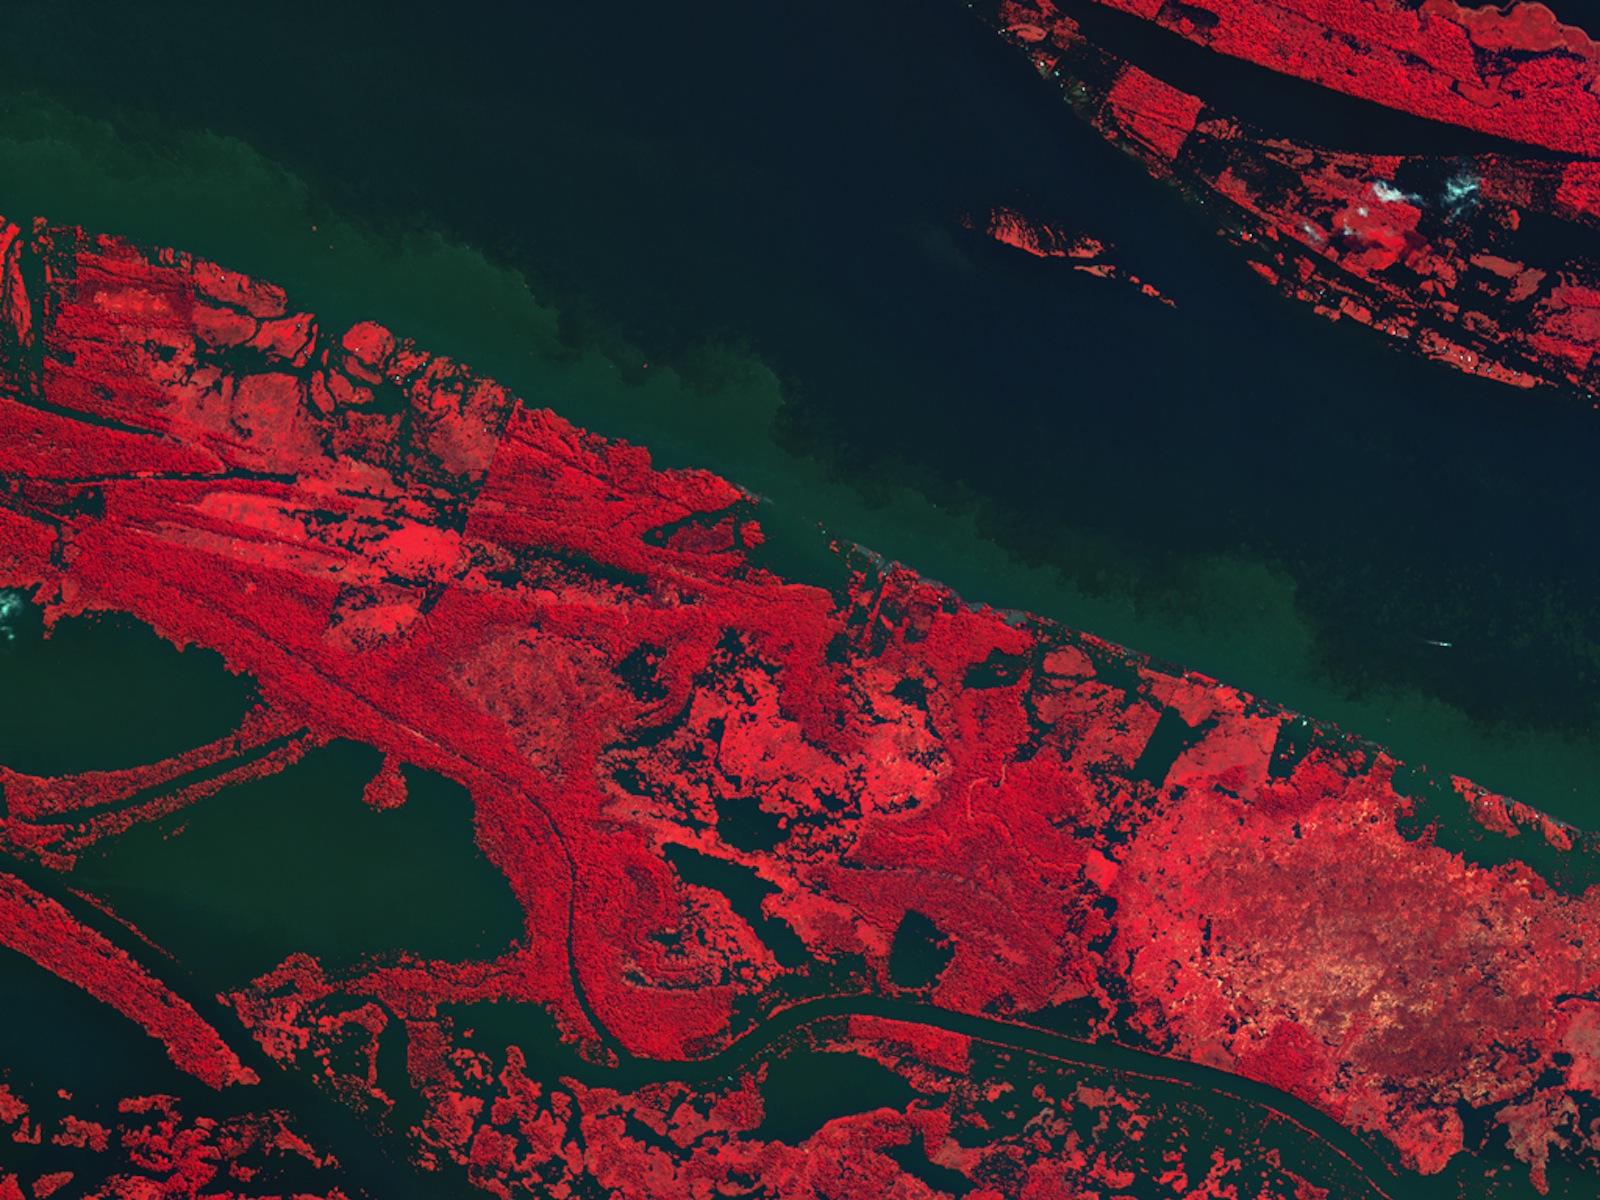 Kompsat-2 View of Amazon River